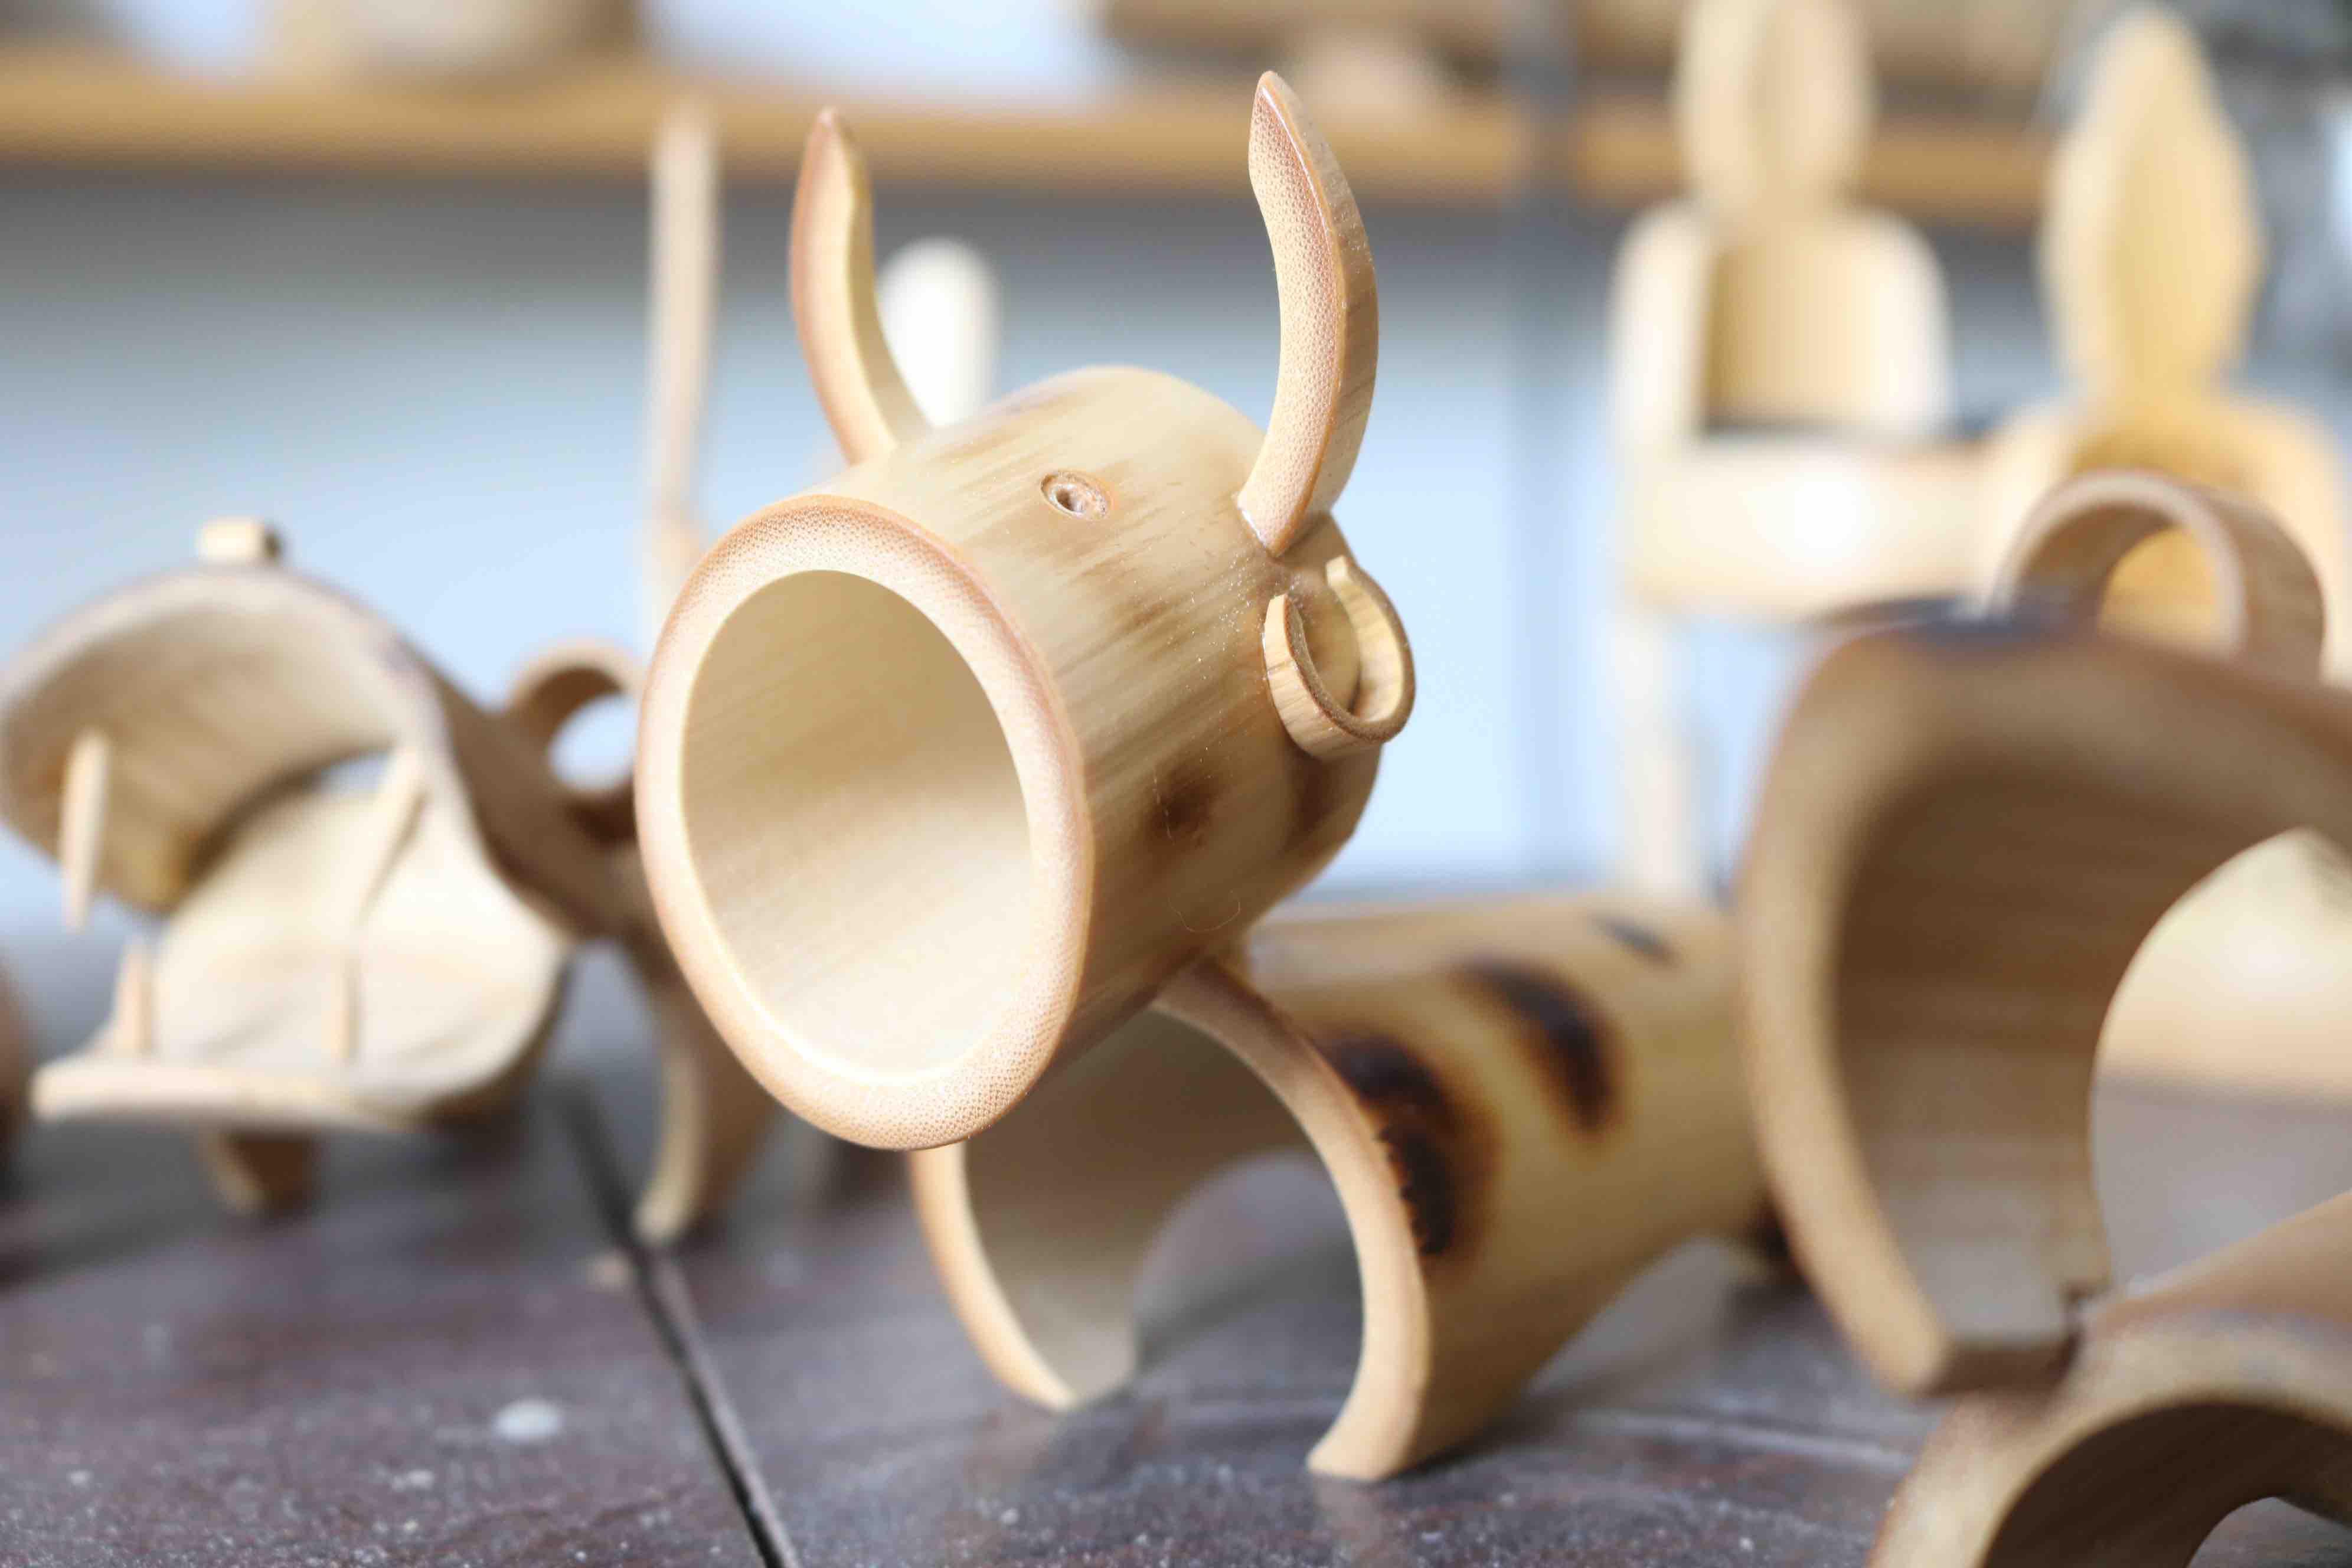 A bamboo buffalo, the symbol representing the upcoming Lunar New Year. Photo: Hoang An / Tuoi Tre